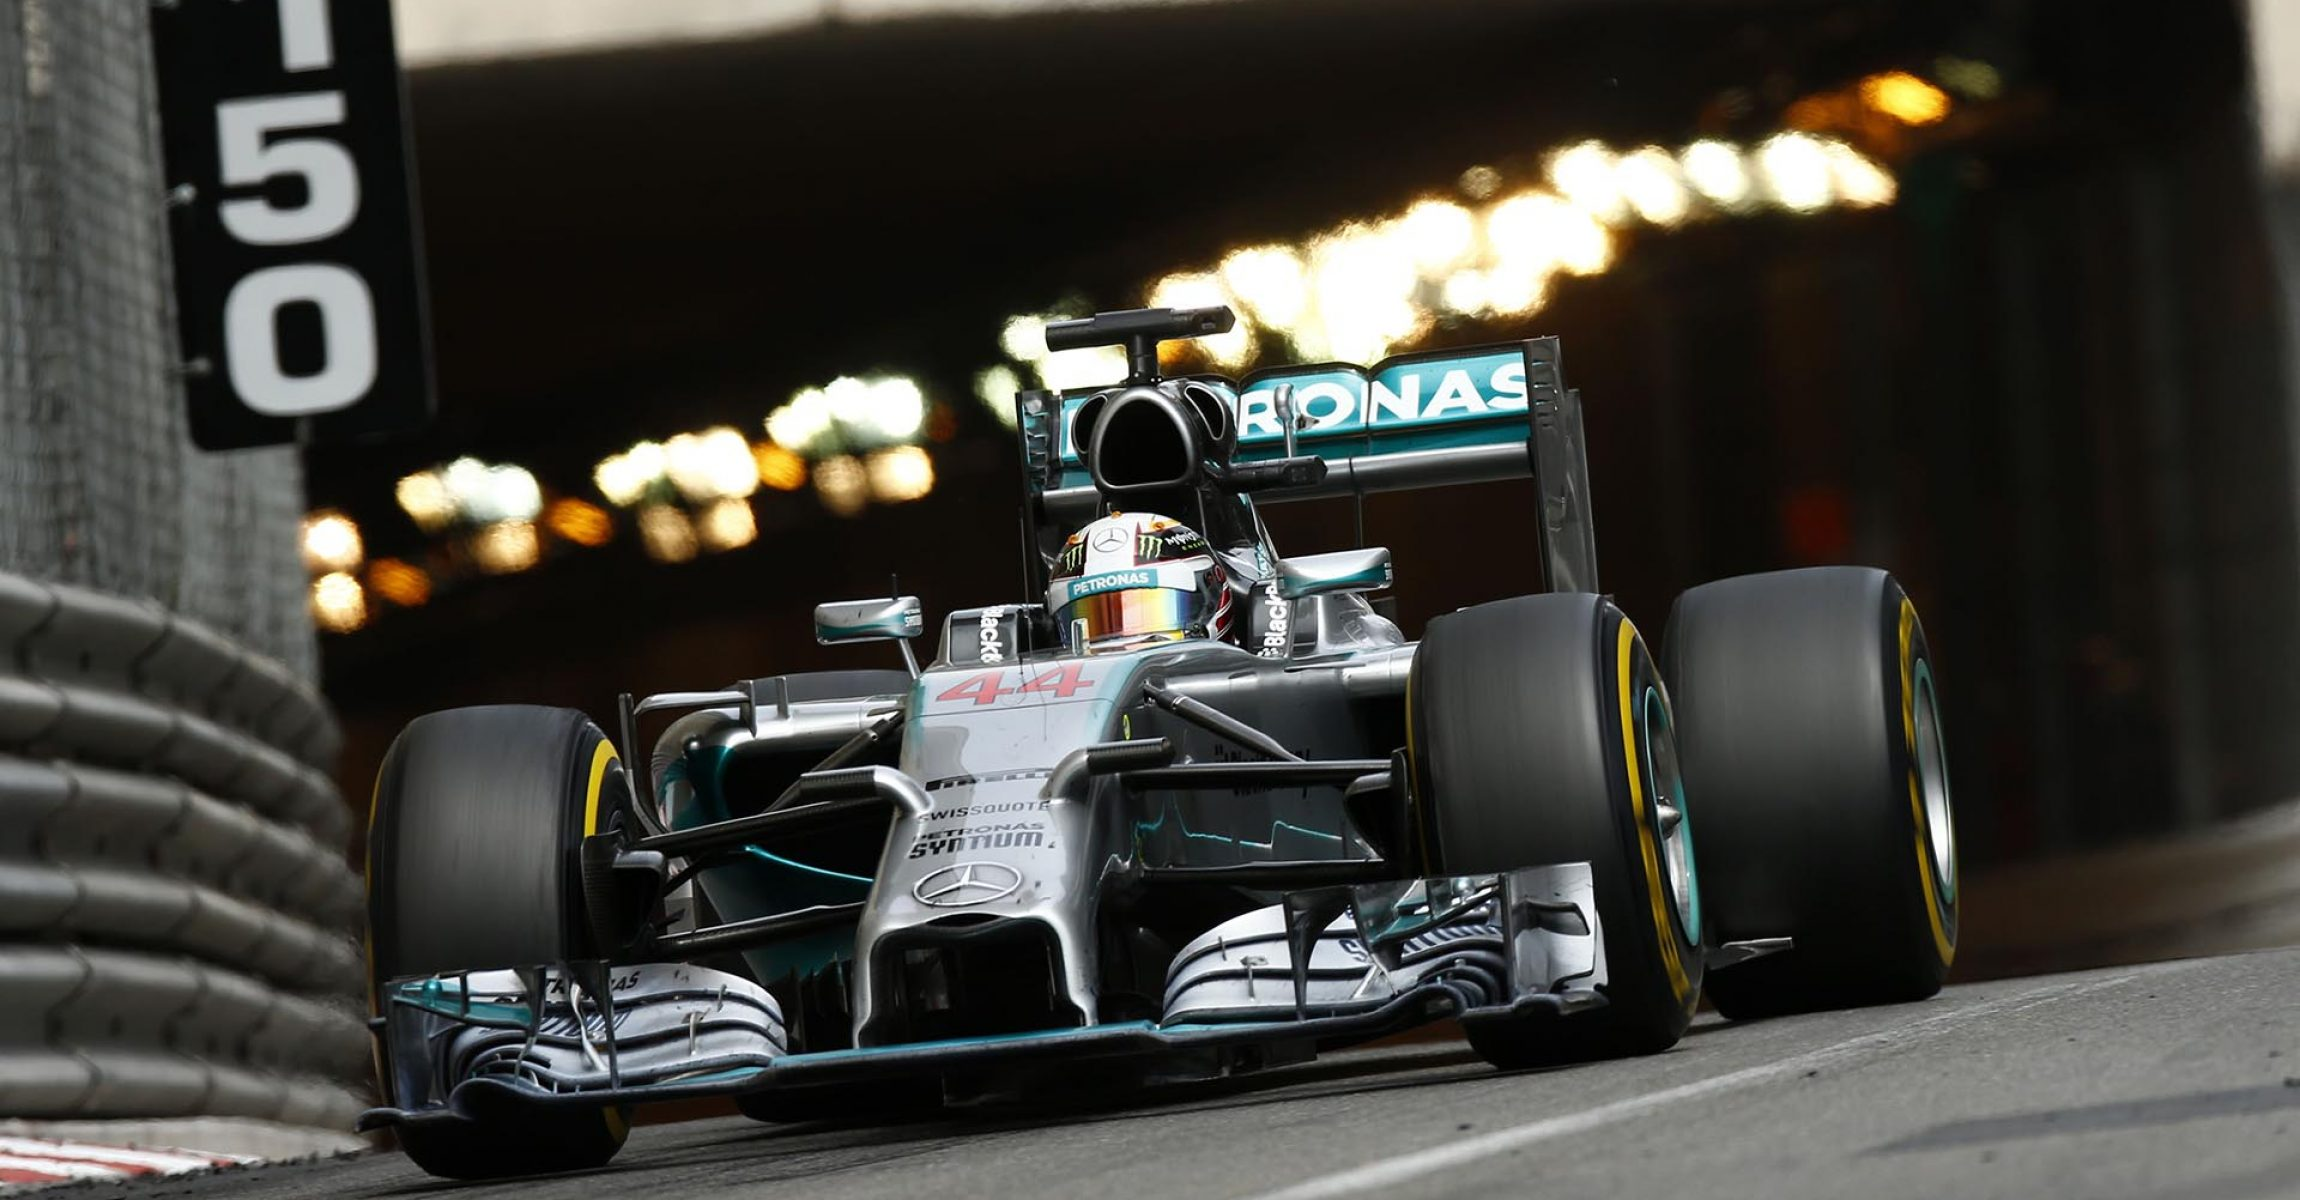 2014 Monaco Grand Prix, Sunday - Wolfgang Wilhelm Lewis Hamilton Mercedes